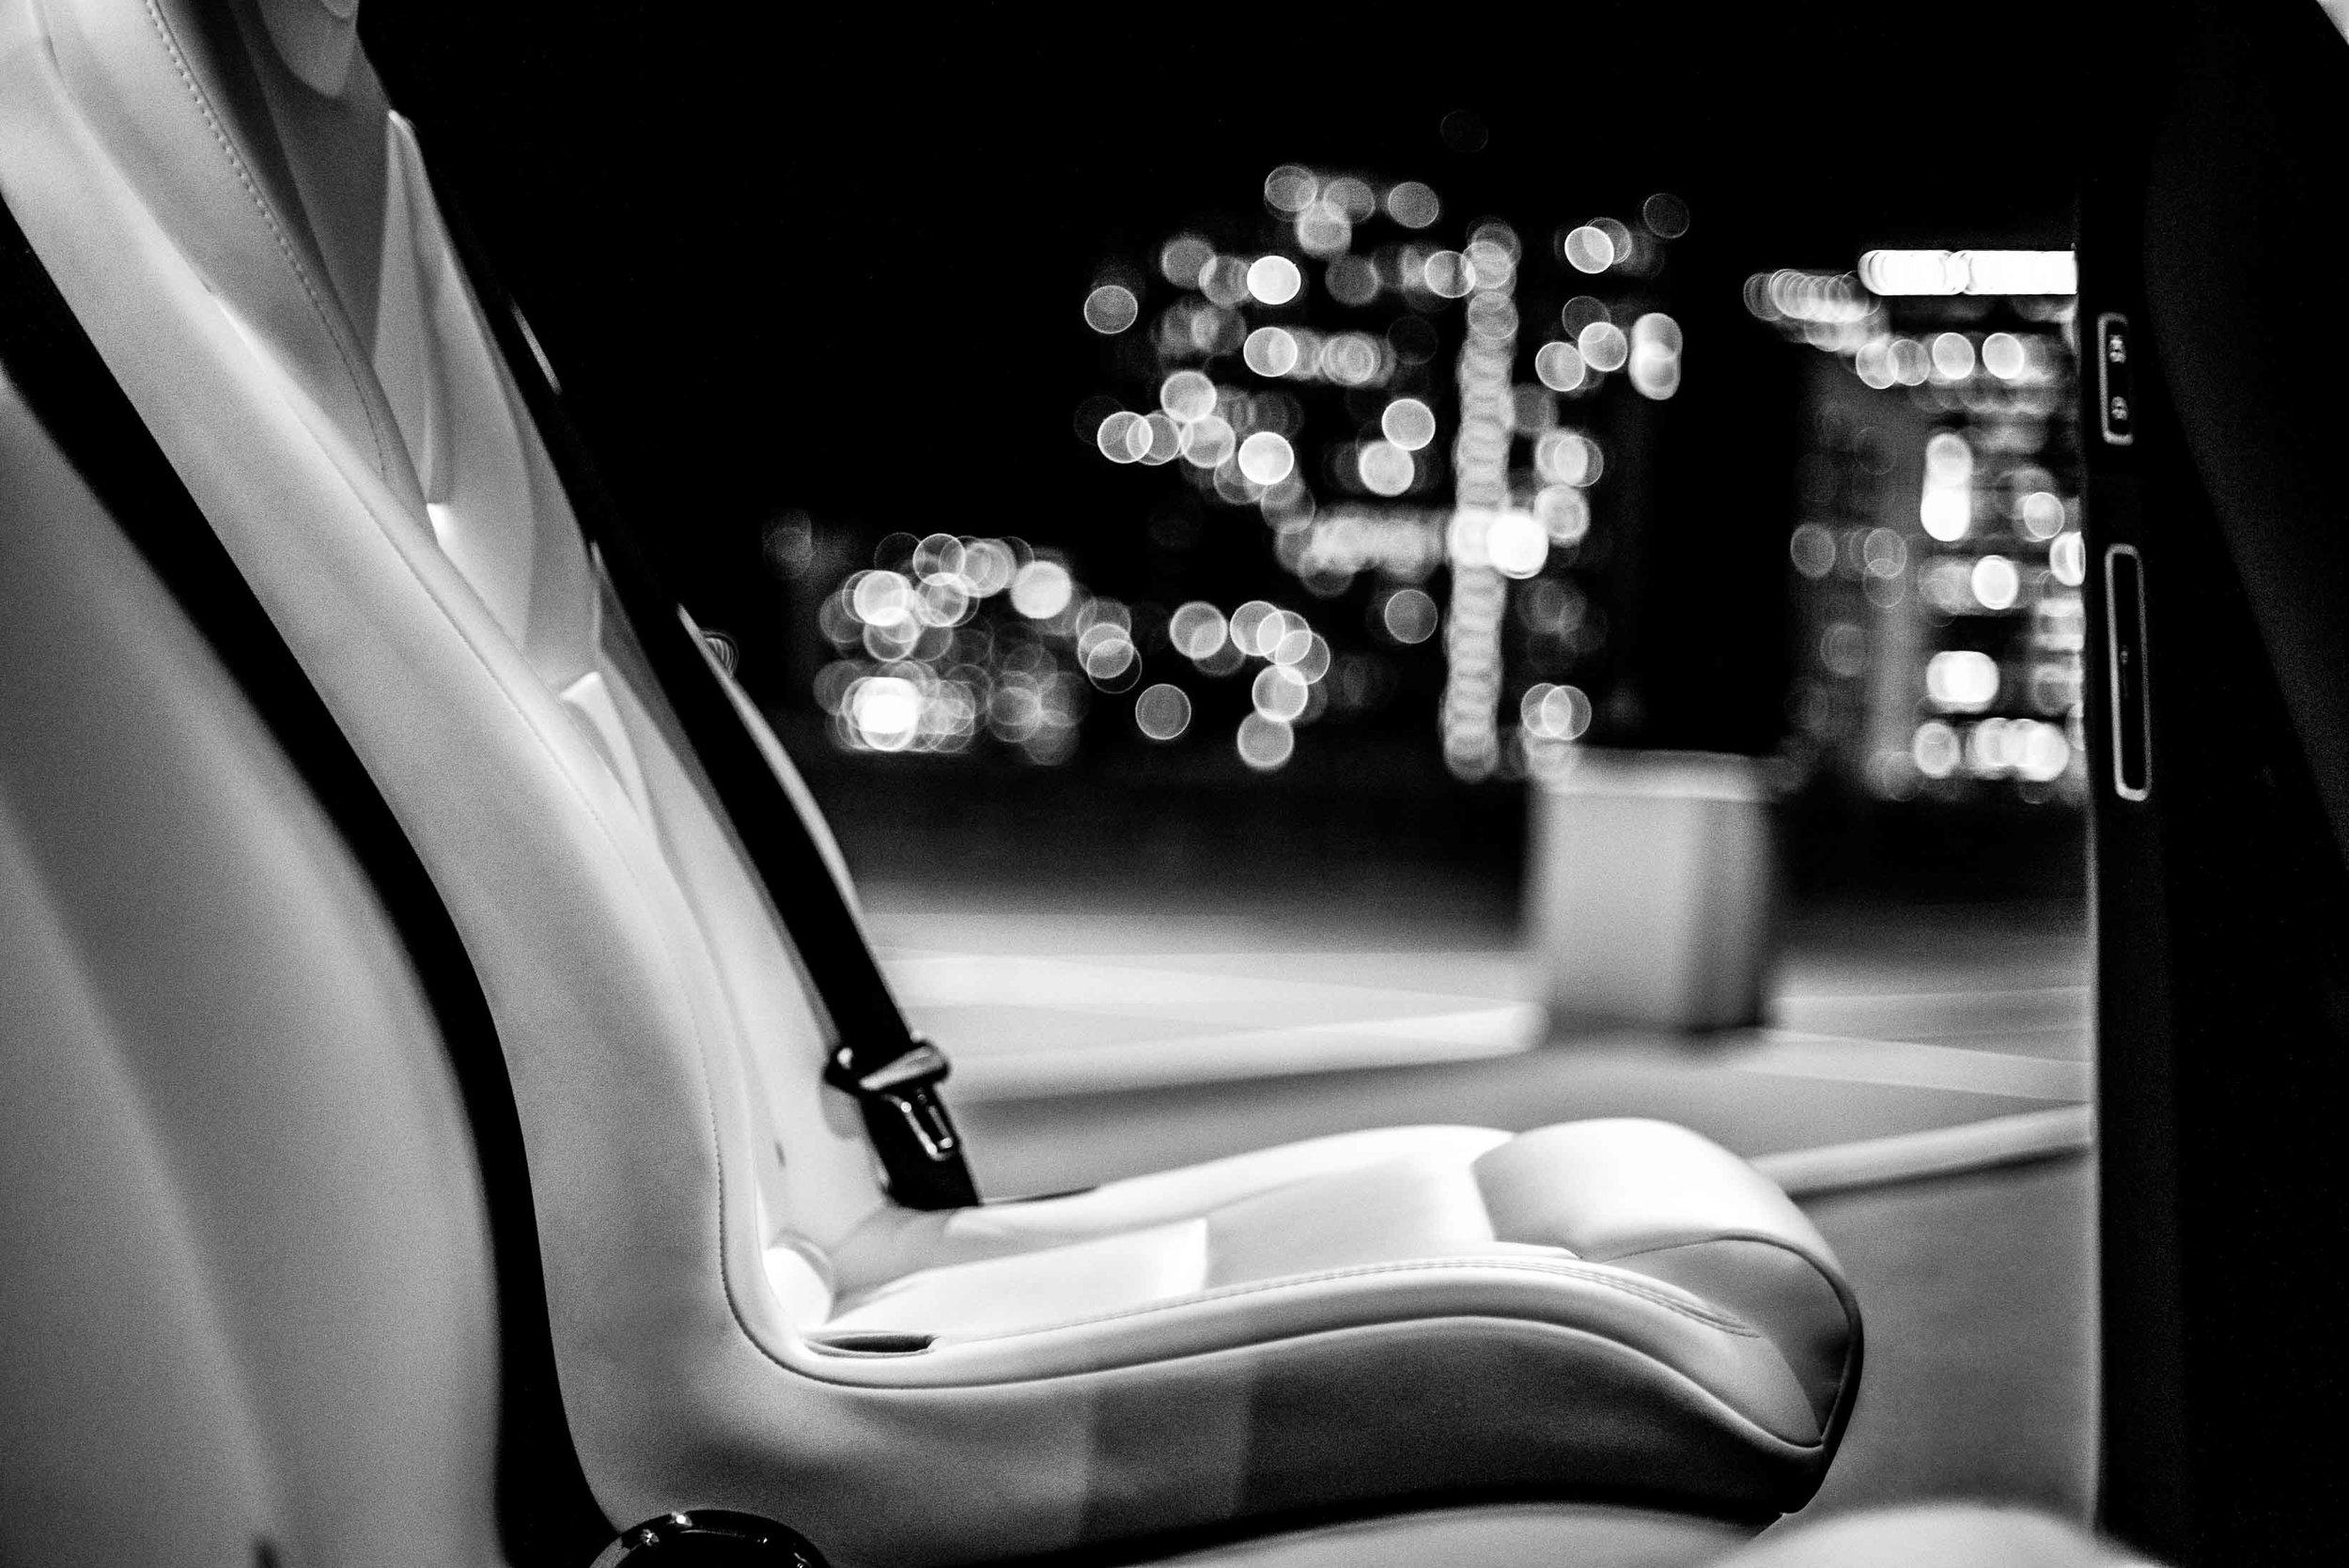 fleet+vehicle+sexy+car+photo+video+speed+tesla+p100d+vadym+guliuk+photography-15.jpg